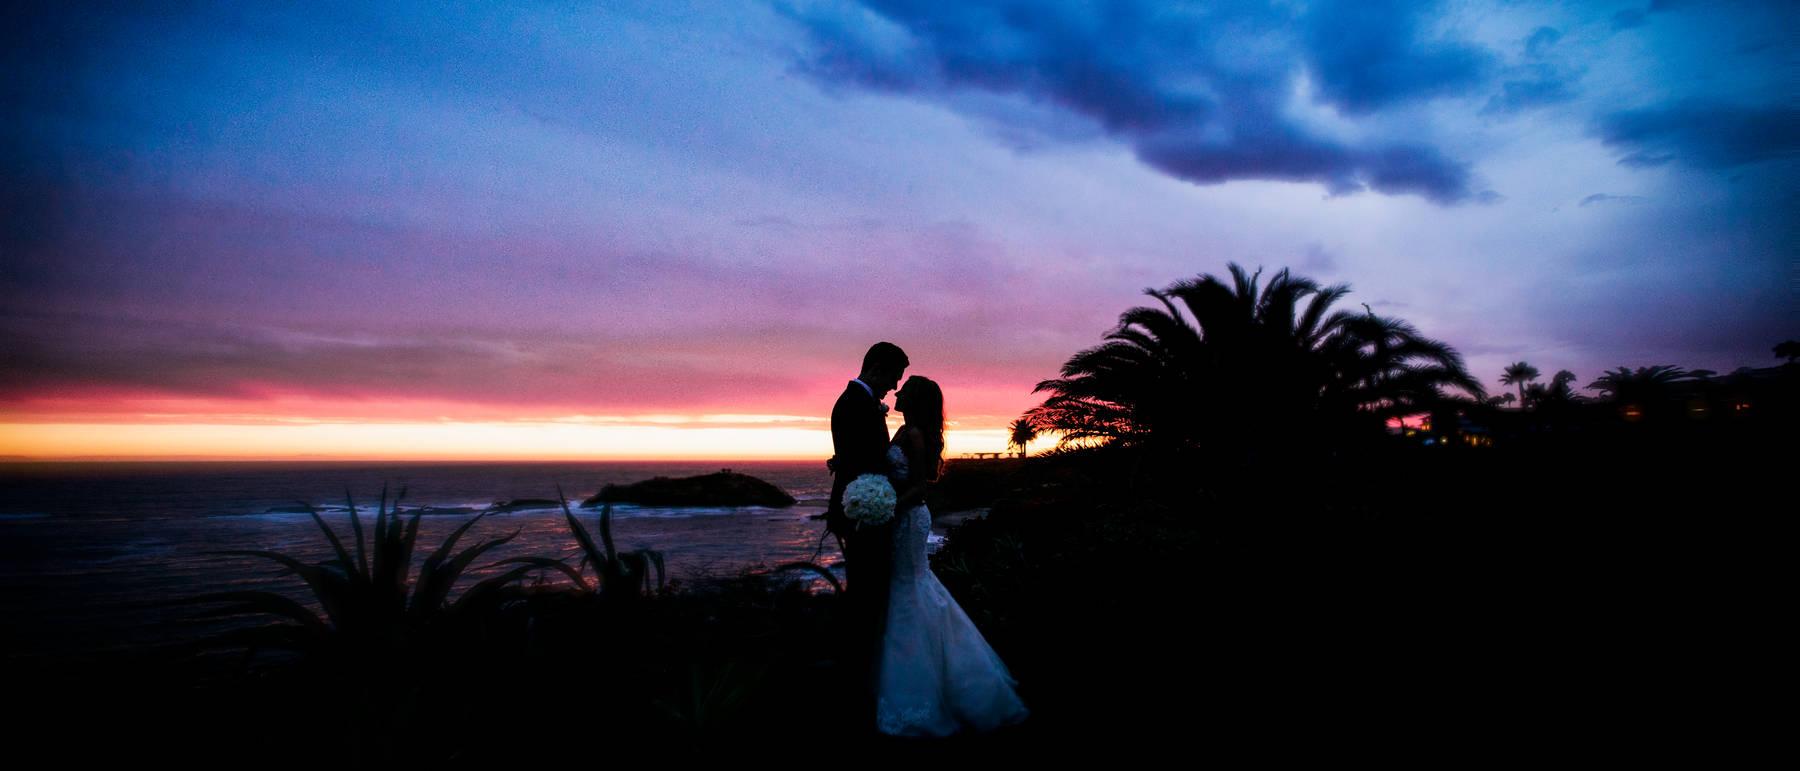 johnandjoseph-wedding-photographer-hz-slider-140